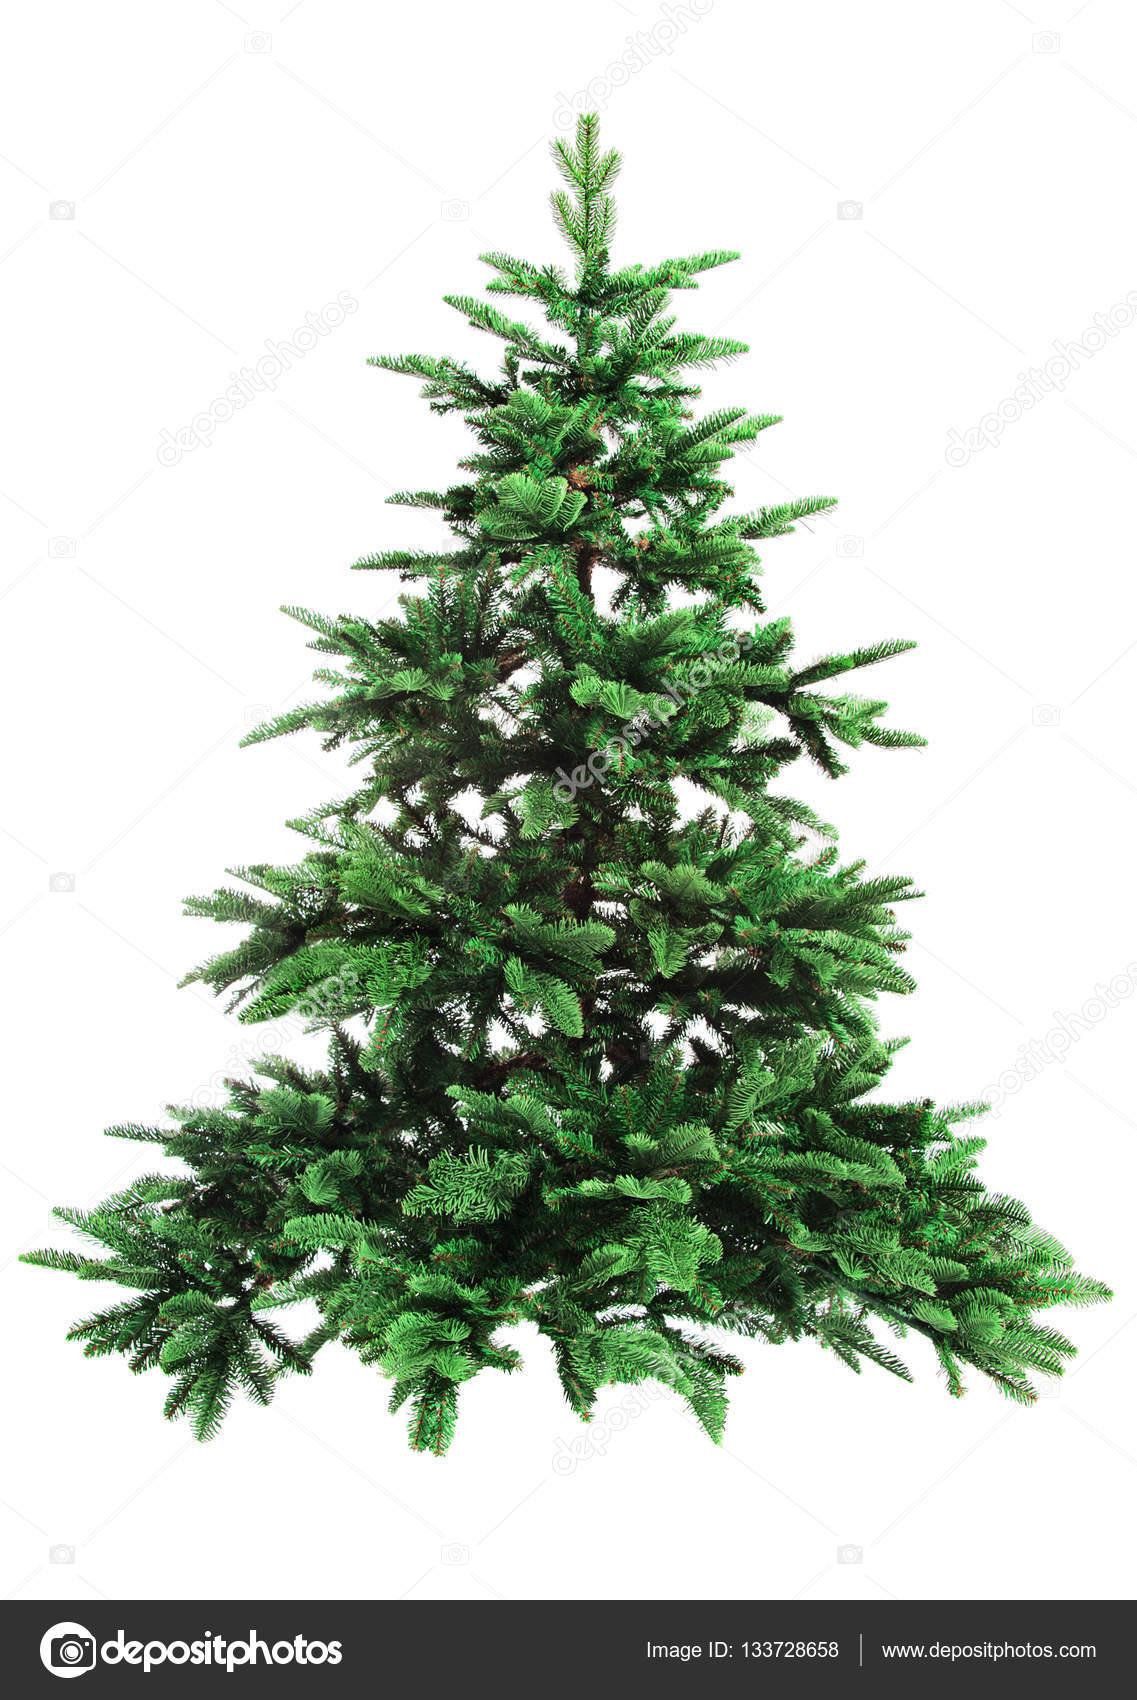 Bare Christmas Tree - Image Home Garden and Tree Rtecx.Com